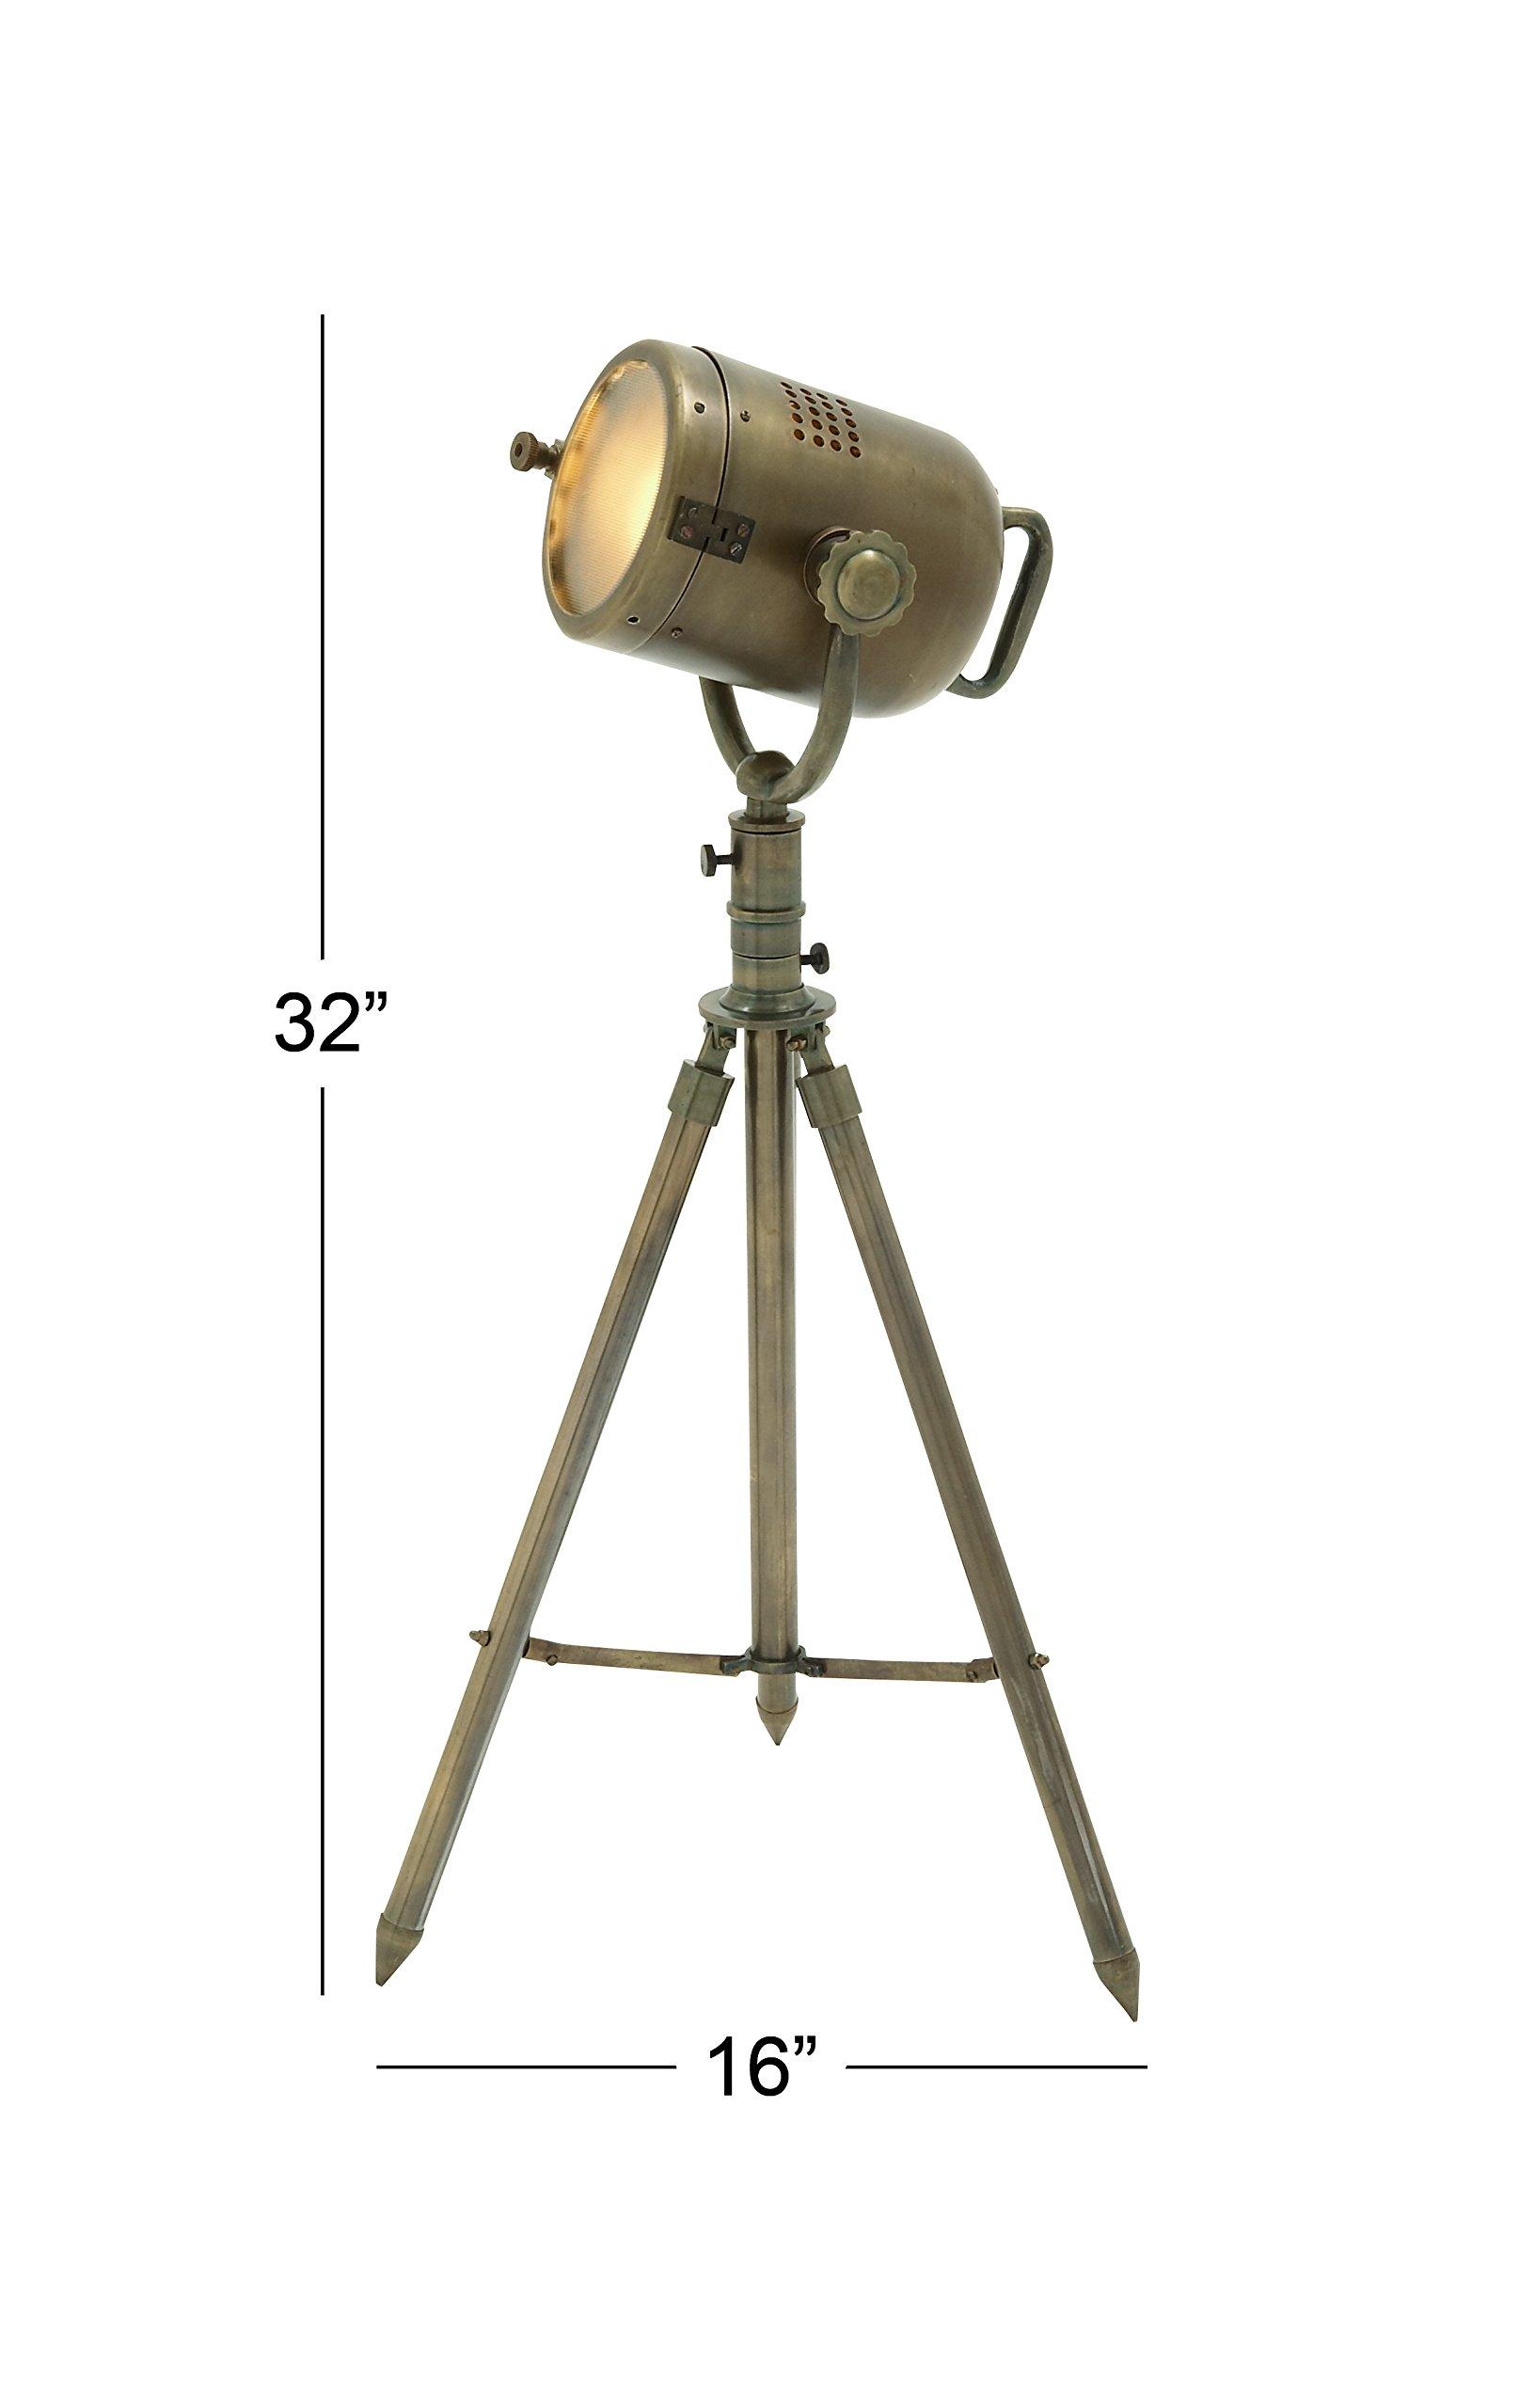 Deco 79 28452 Aluminum Spot Light 32'' H